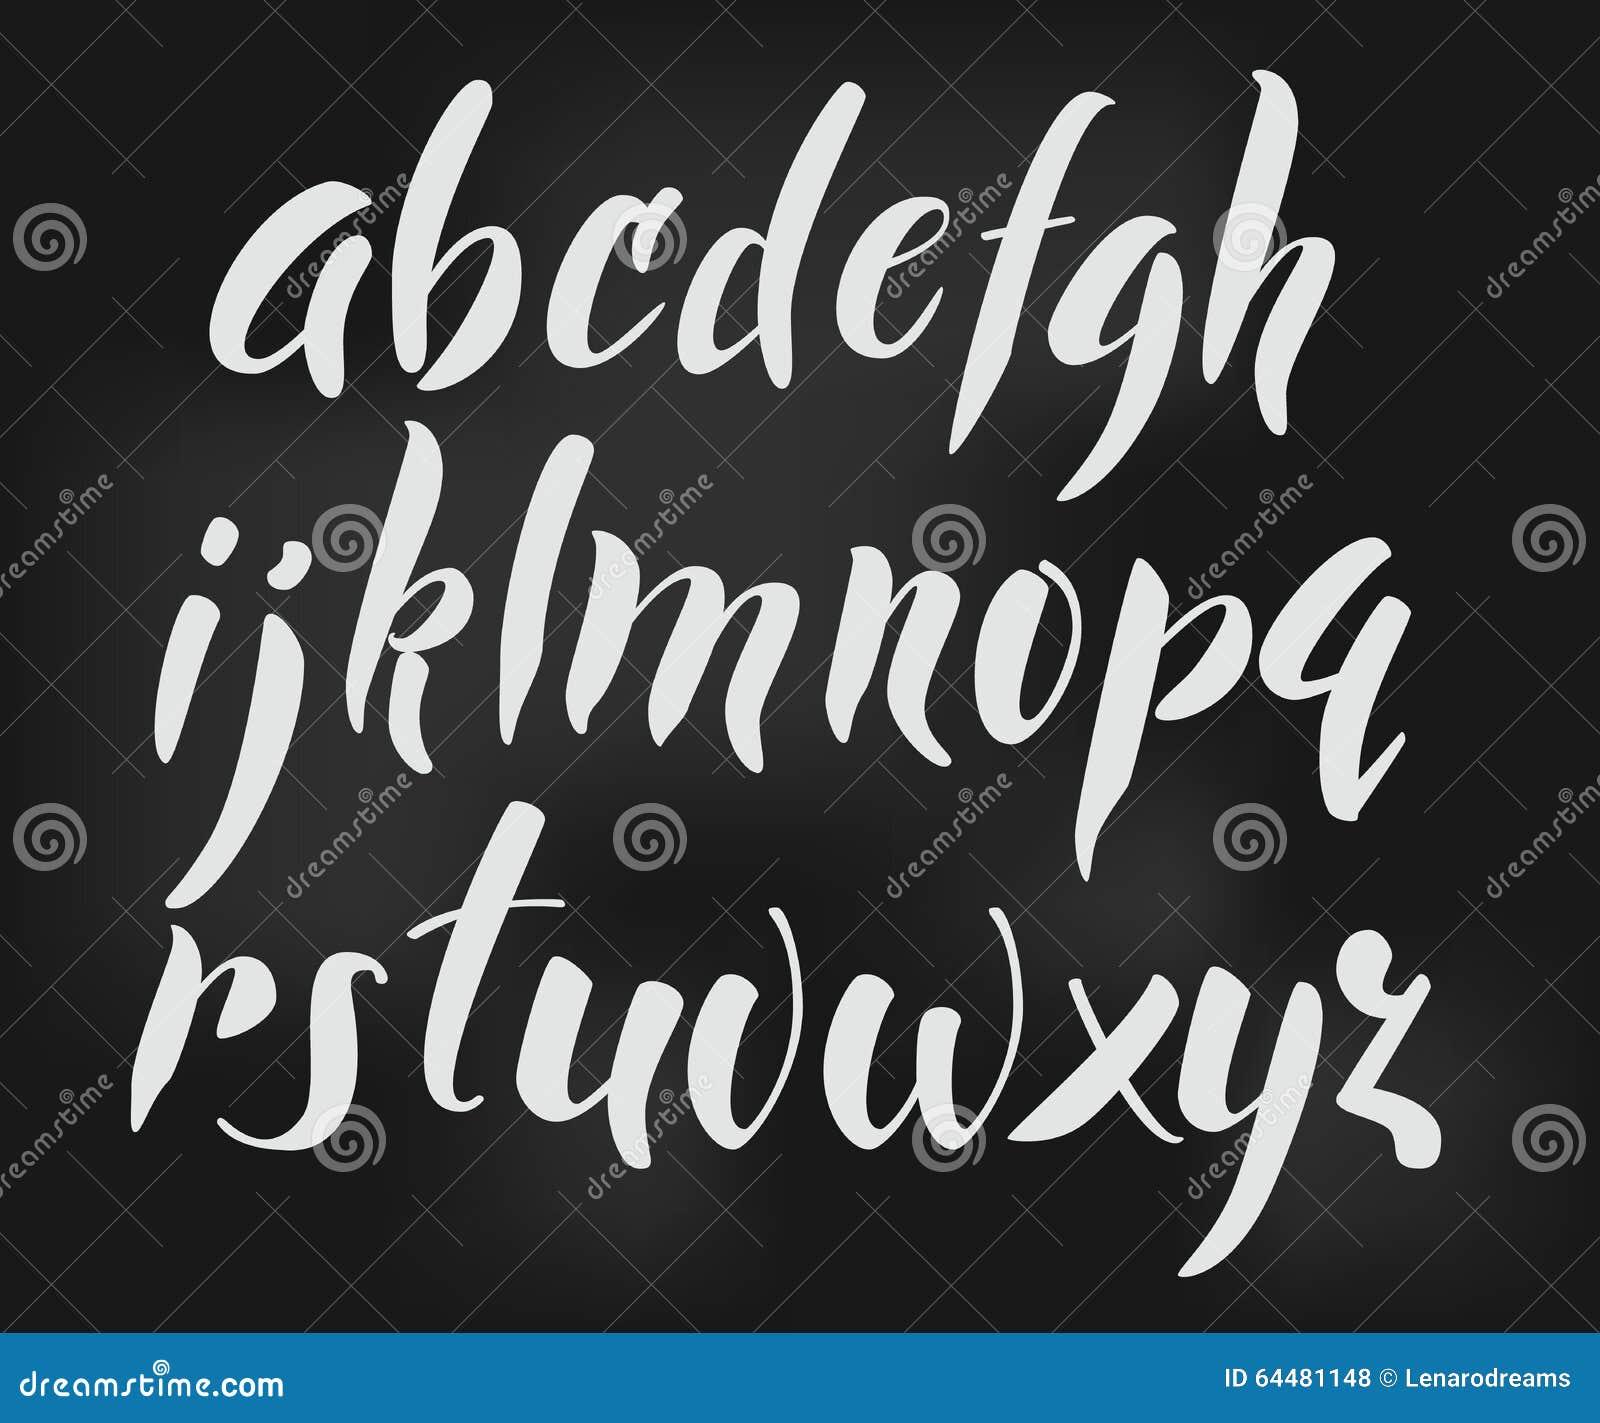 Brush Style Alphabet Calligraphy Low Case Letters Cursive Font Cute For Expressive Retro Lettering